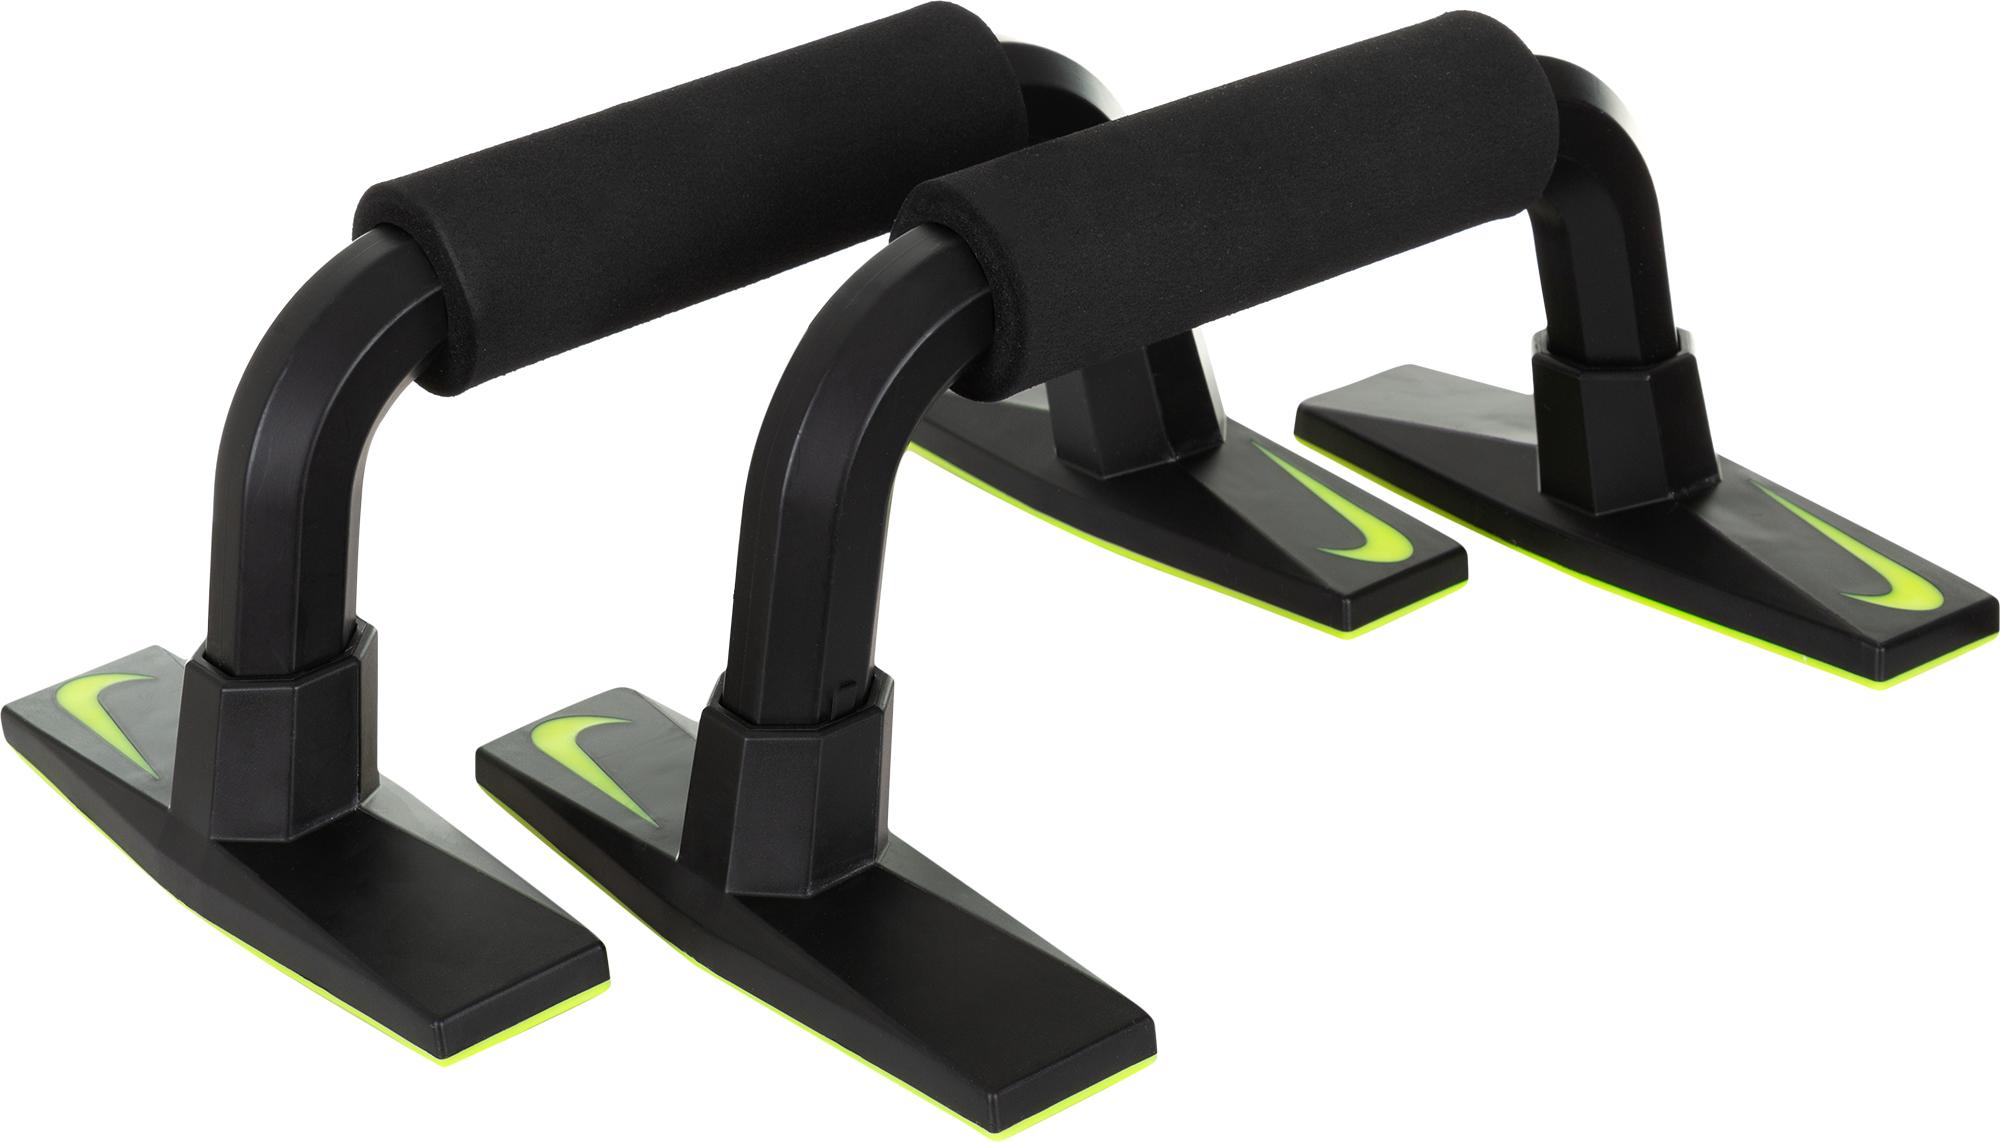 все цены на Nike Упоры для отжиманий Nike Accessories онлайн